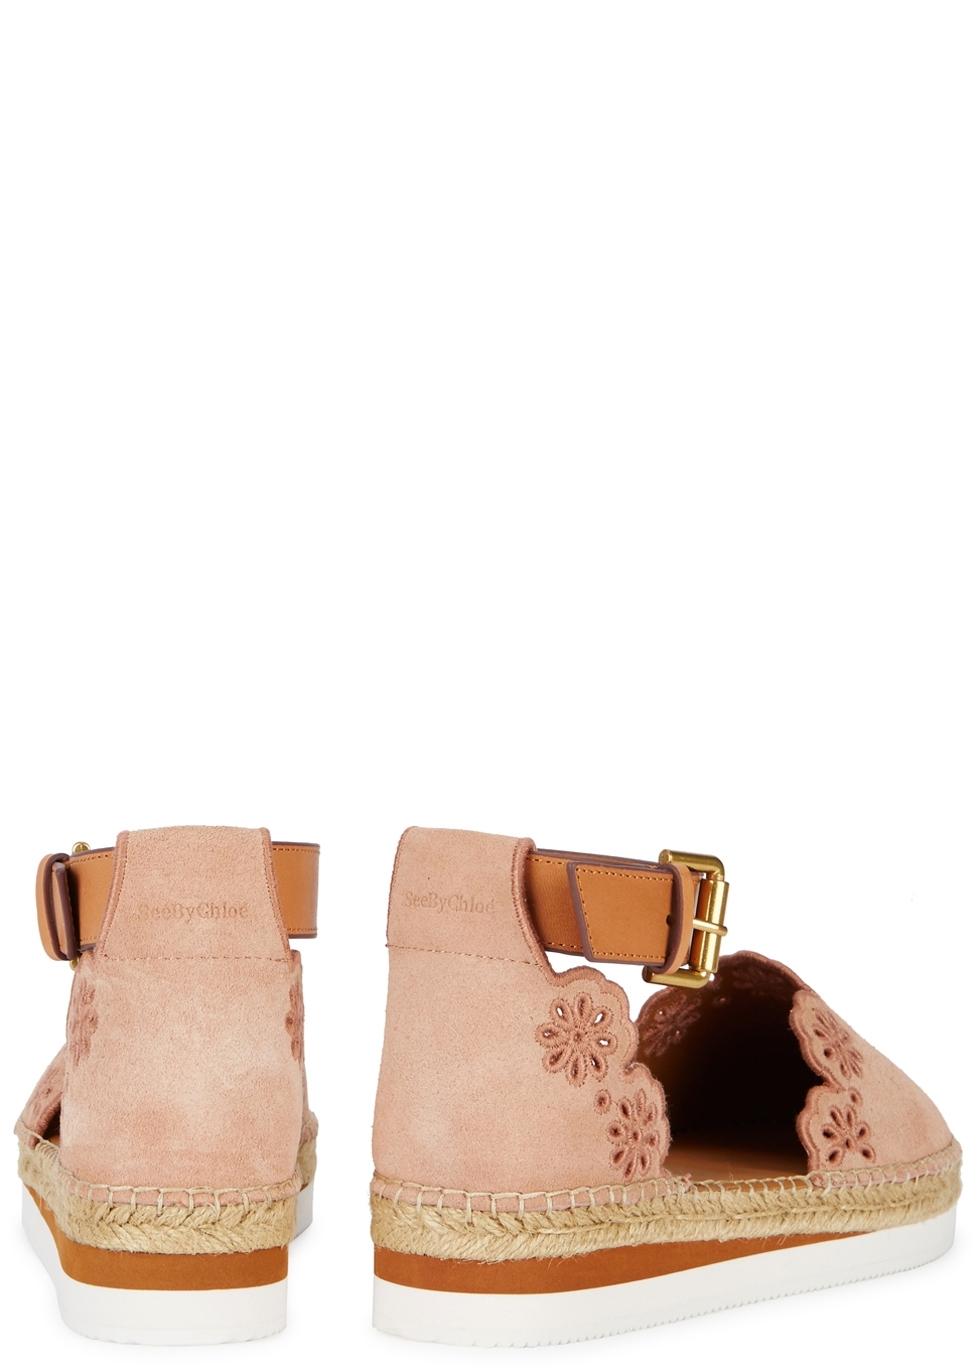 Sale Sneakernews Buy Cheap Fashion Style Chloé Glyn Blush Suede Espadrilles 30HILNCVwC